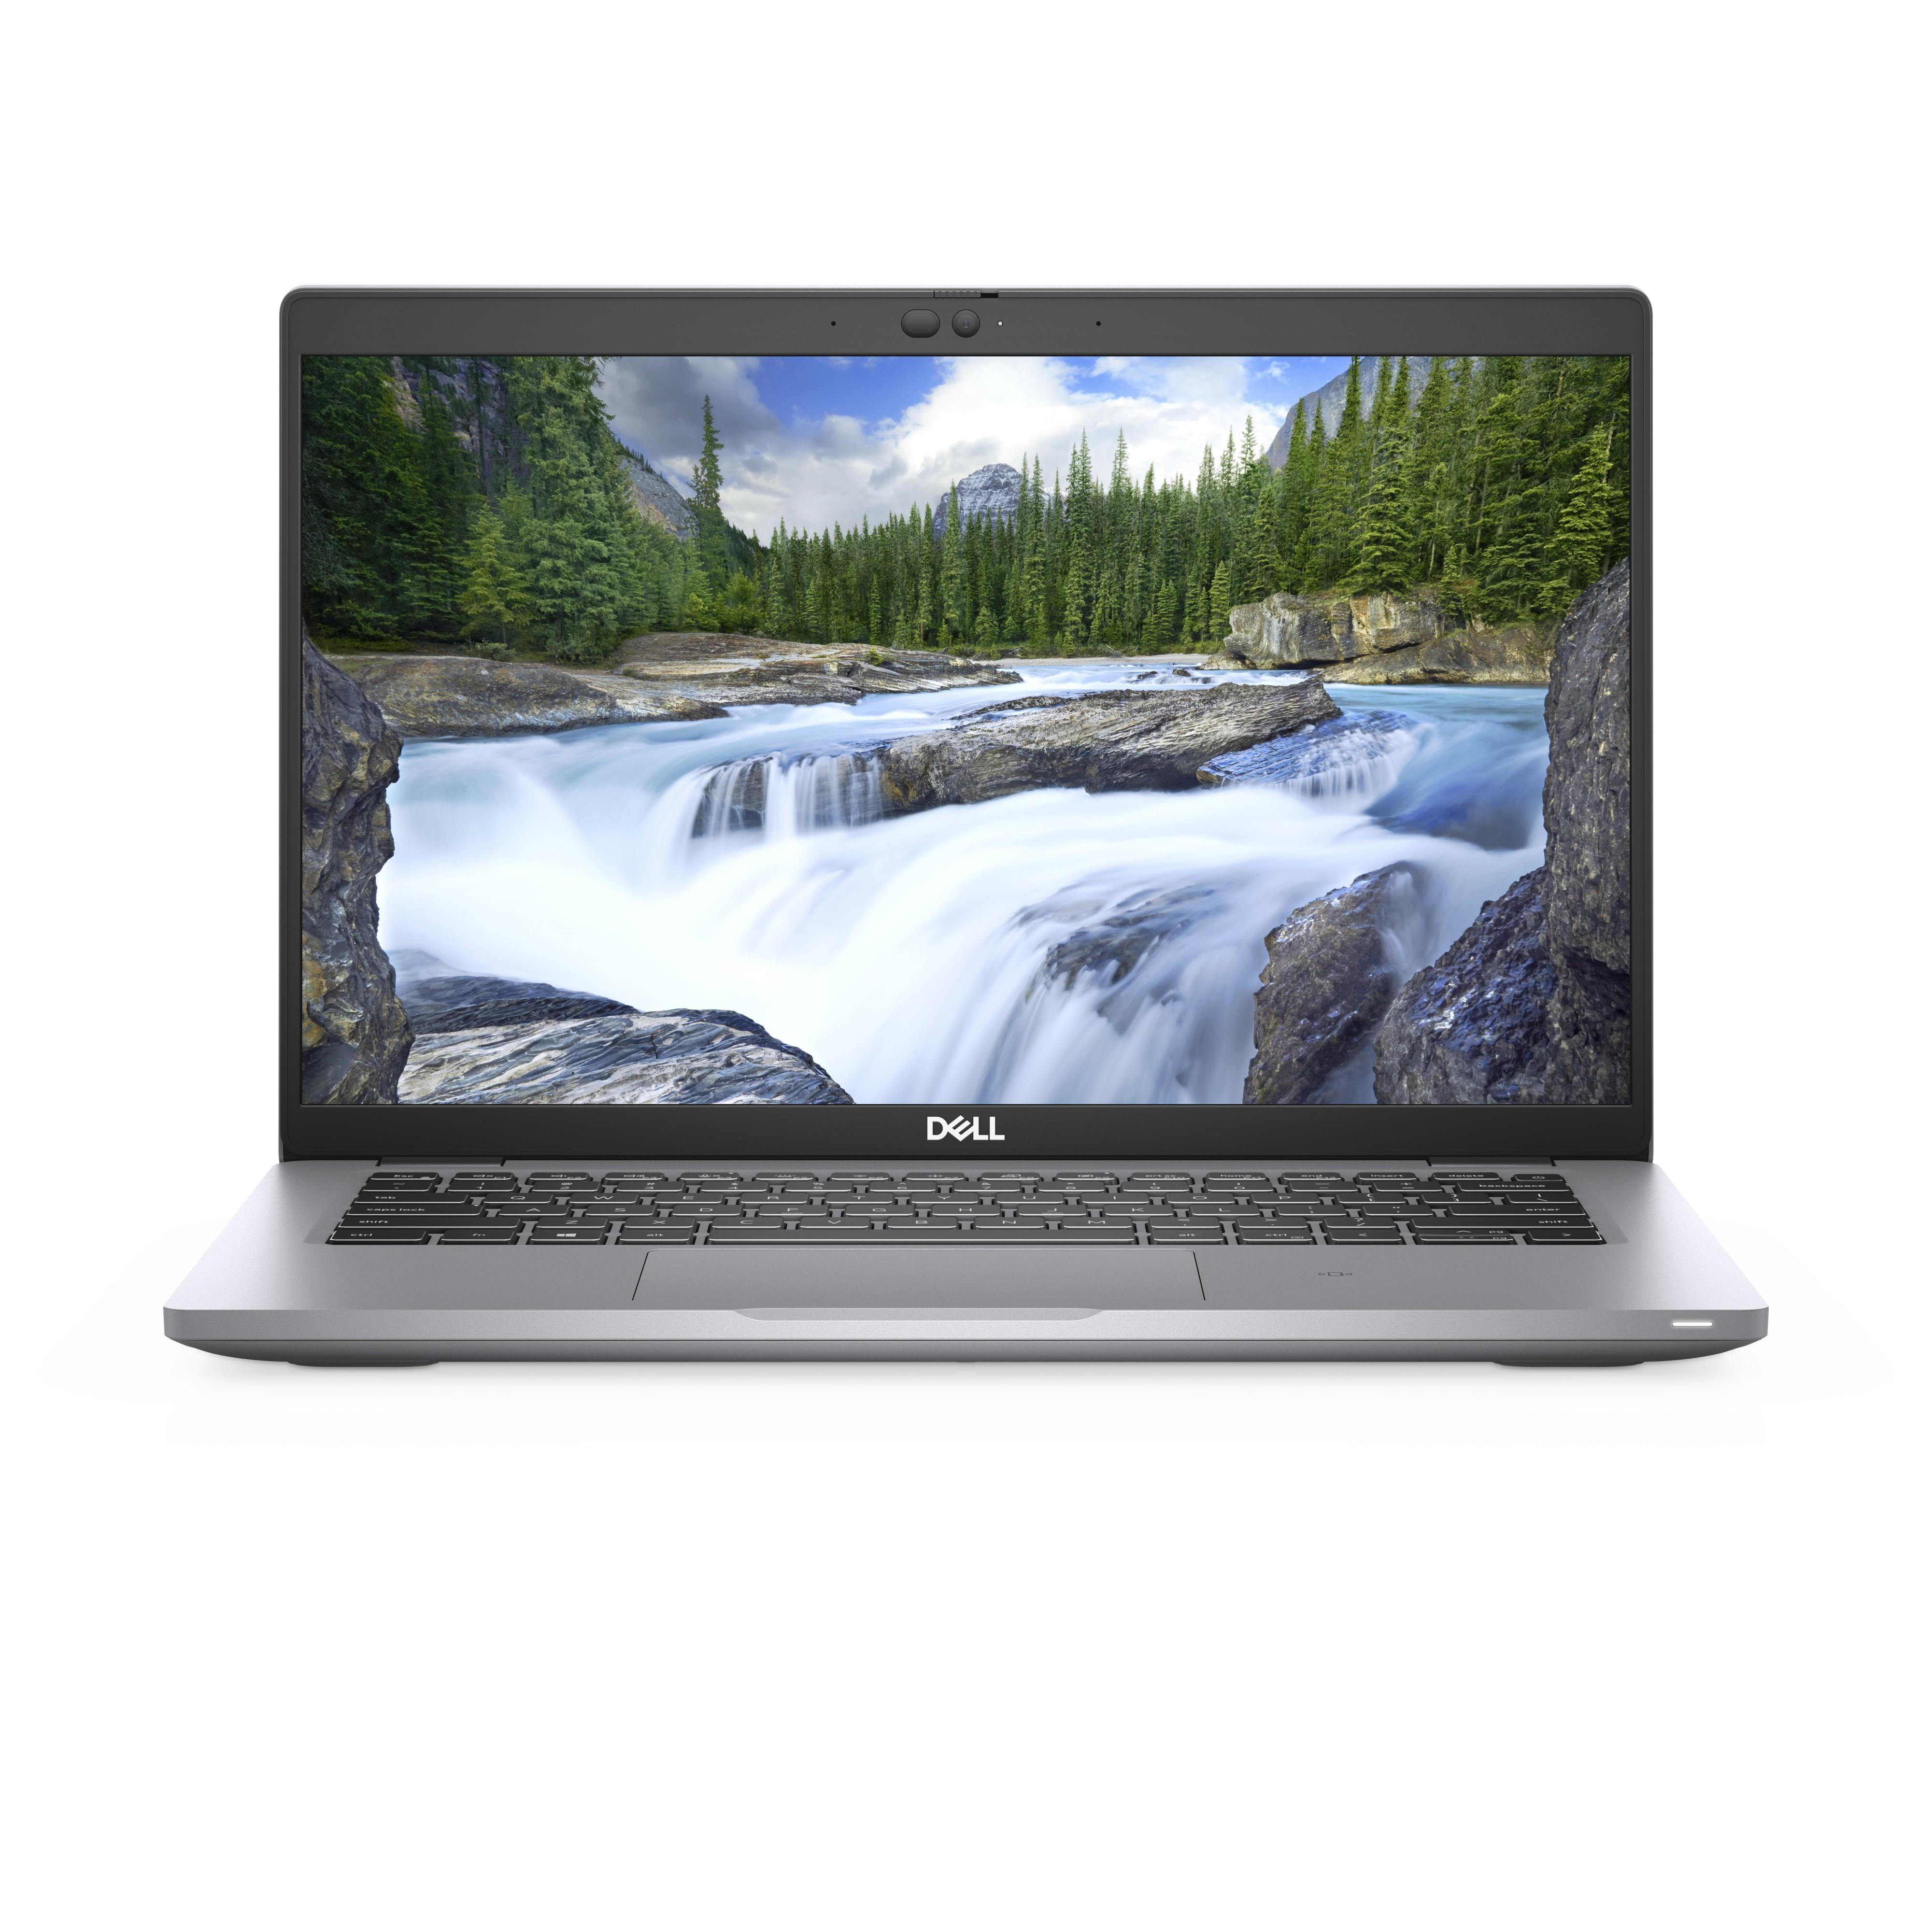 "DELL Latitude 5420 Notebook 35,6 cm (14"") Full HD Intel® 11de generatie Core™ i5 8 GB DDR4-SDRAM 256 GB SSD Wi-Fi 6 (802.11ax) Windows 10 Pro Grijs"